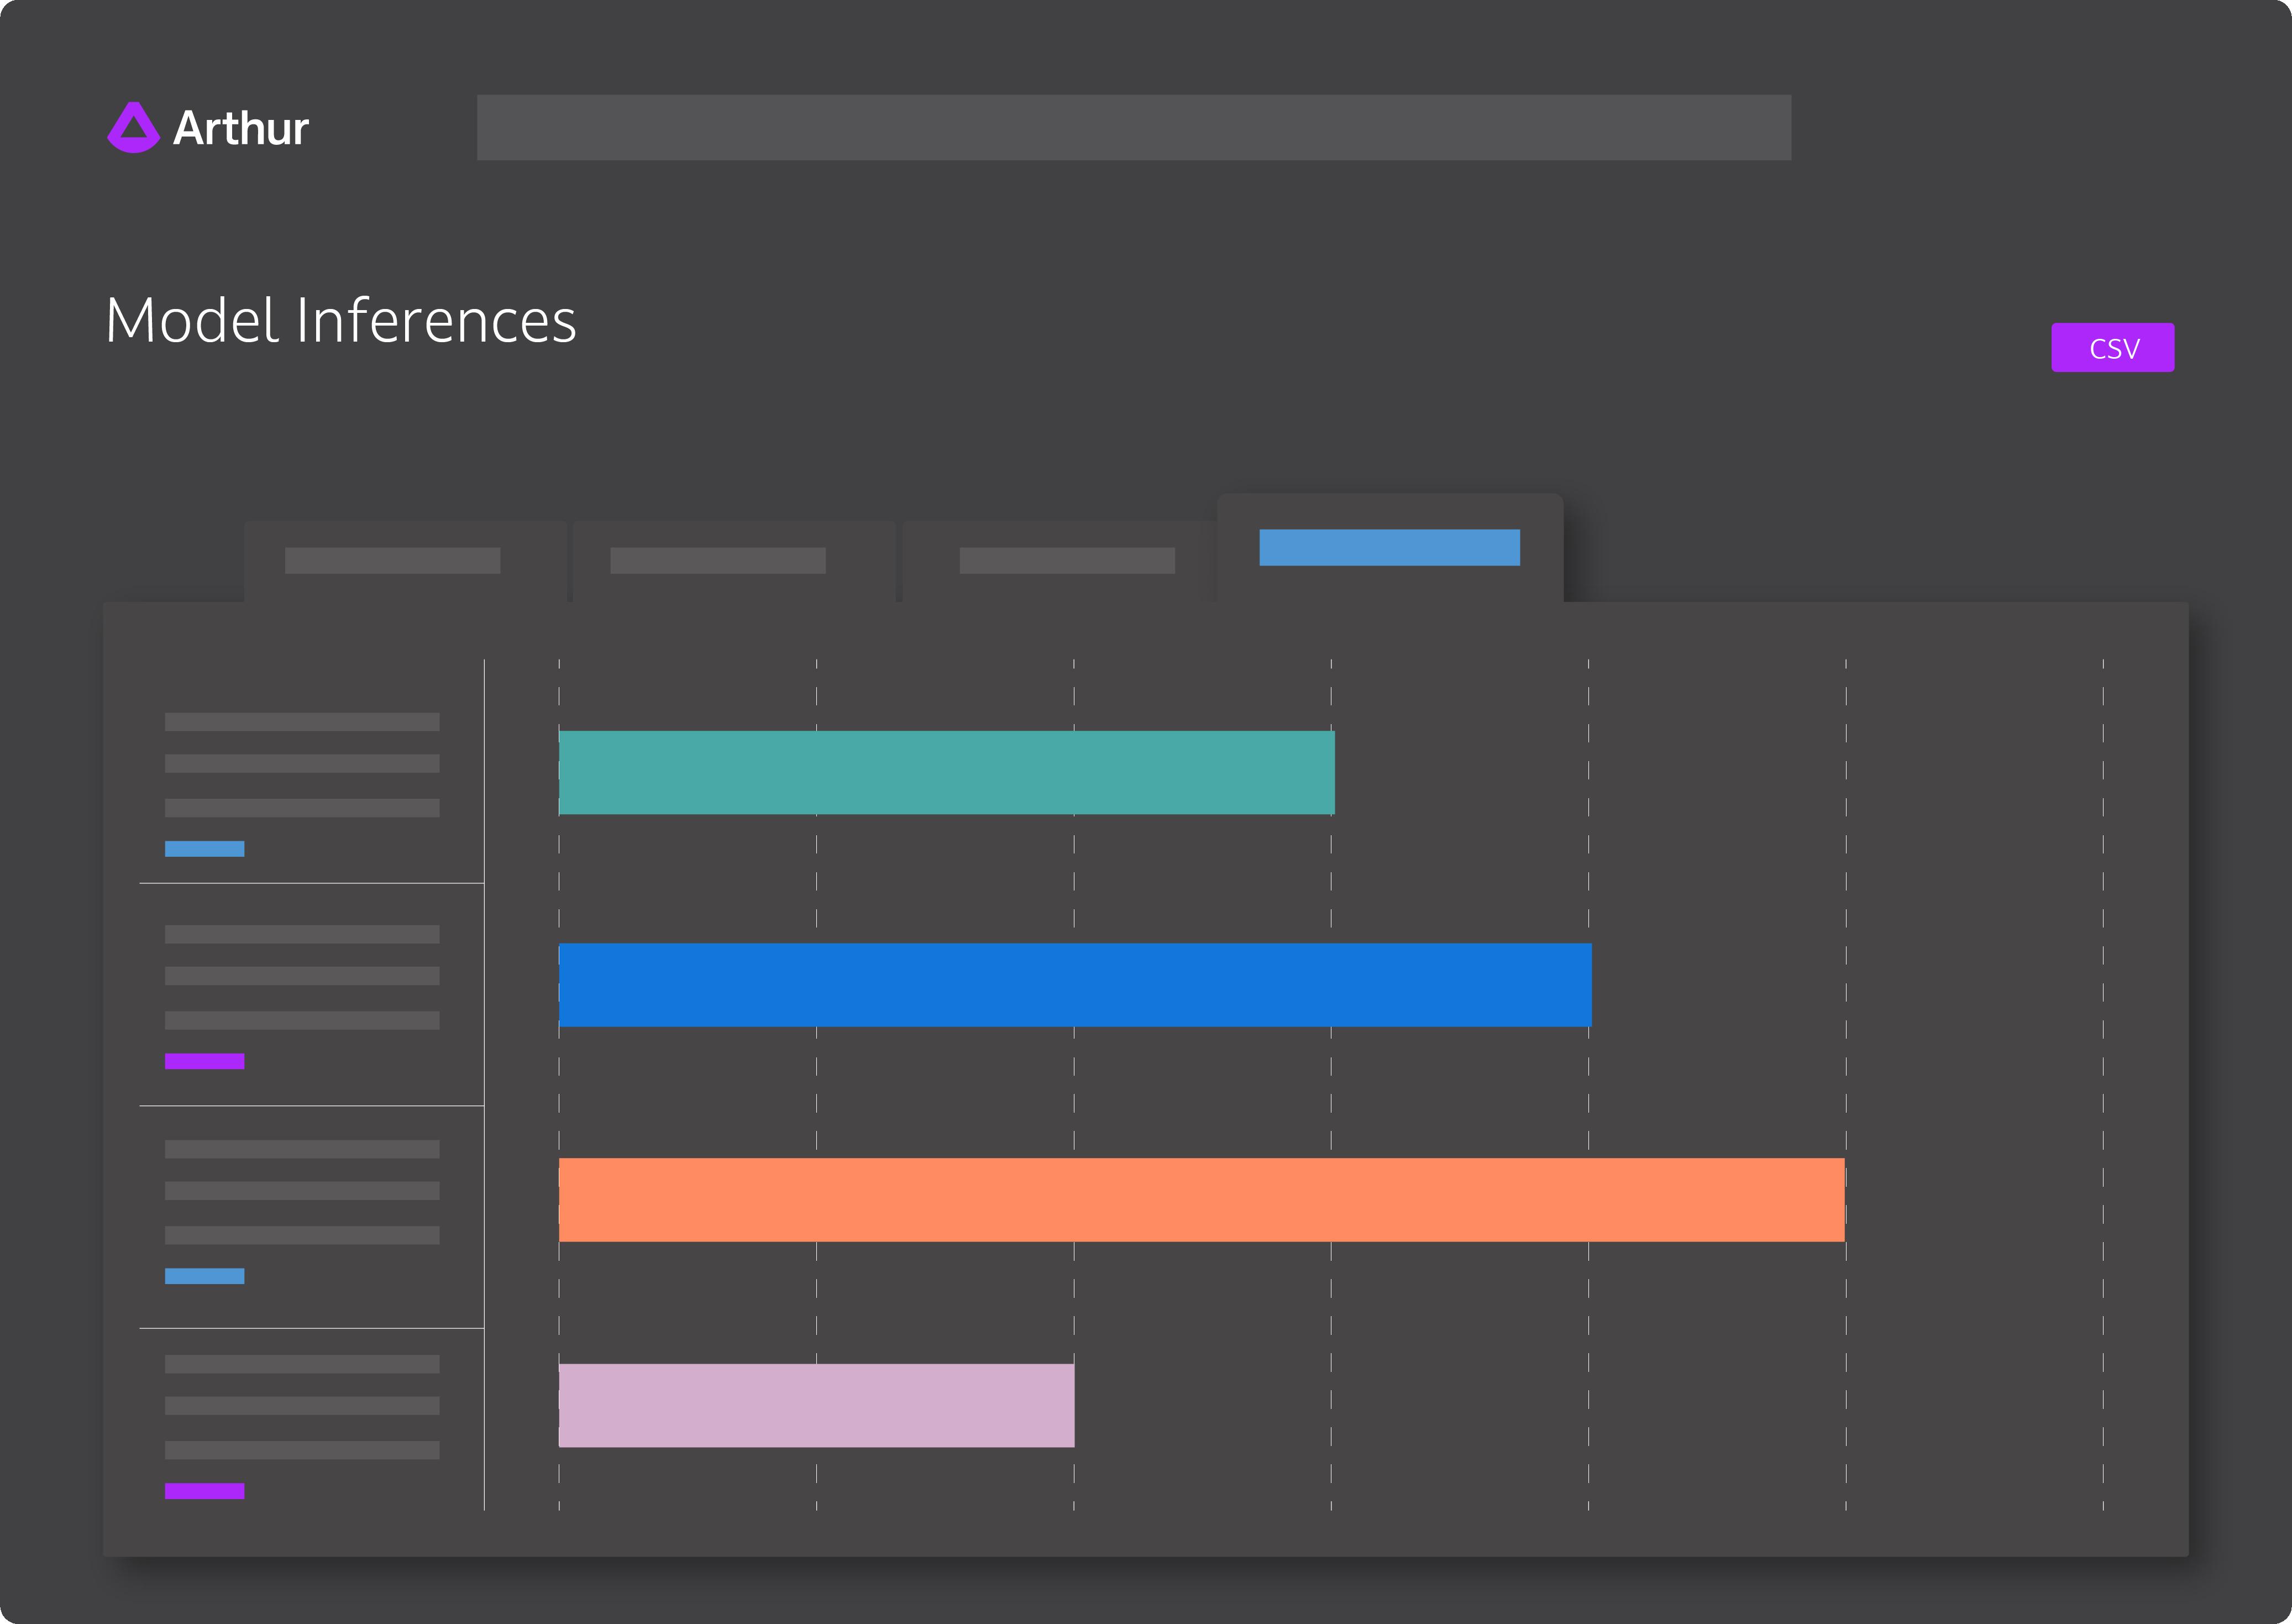 arthur model inferences explainability graph mock up